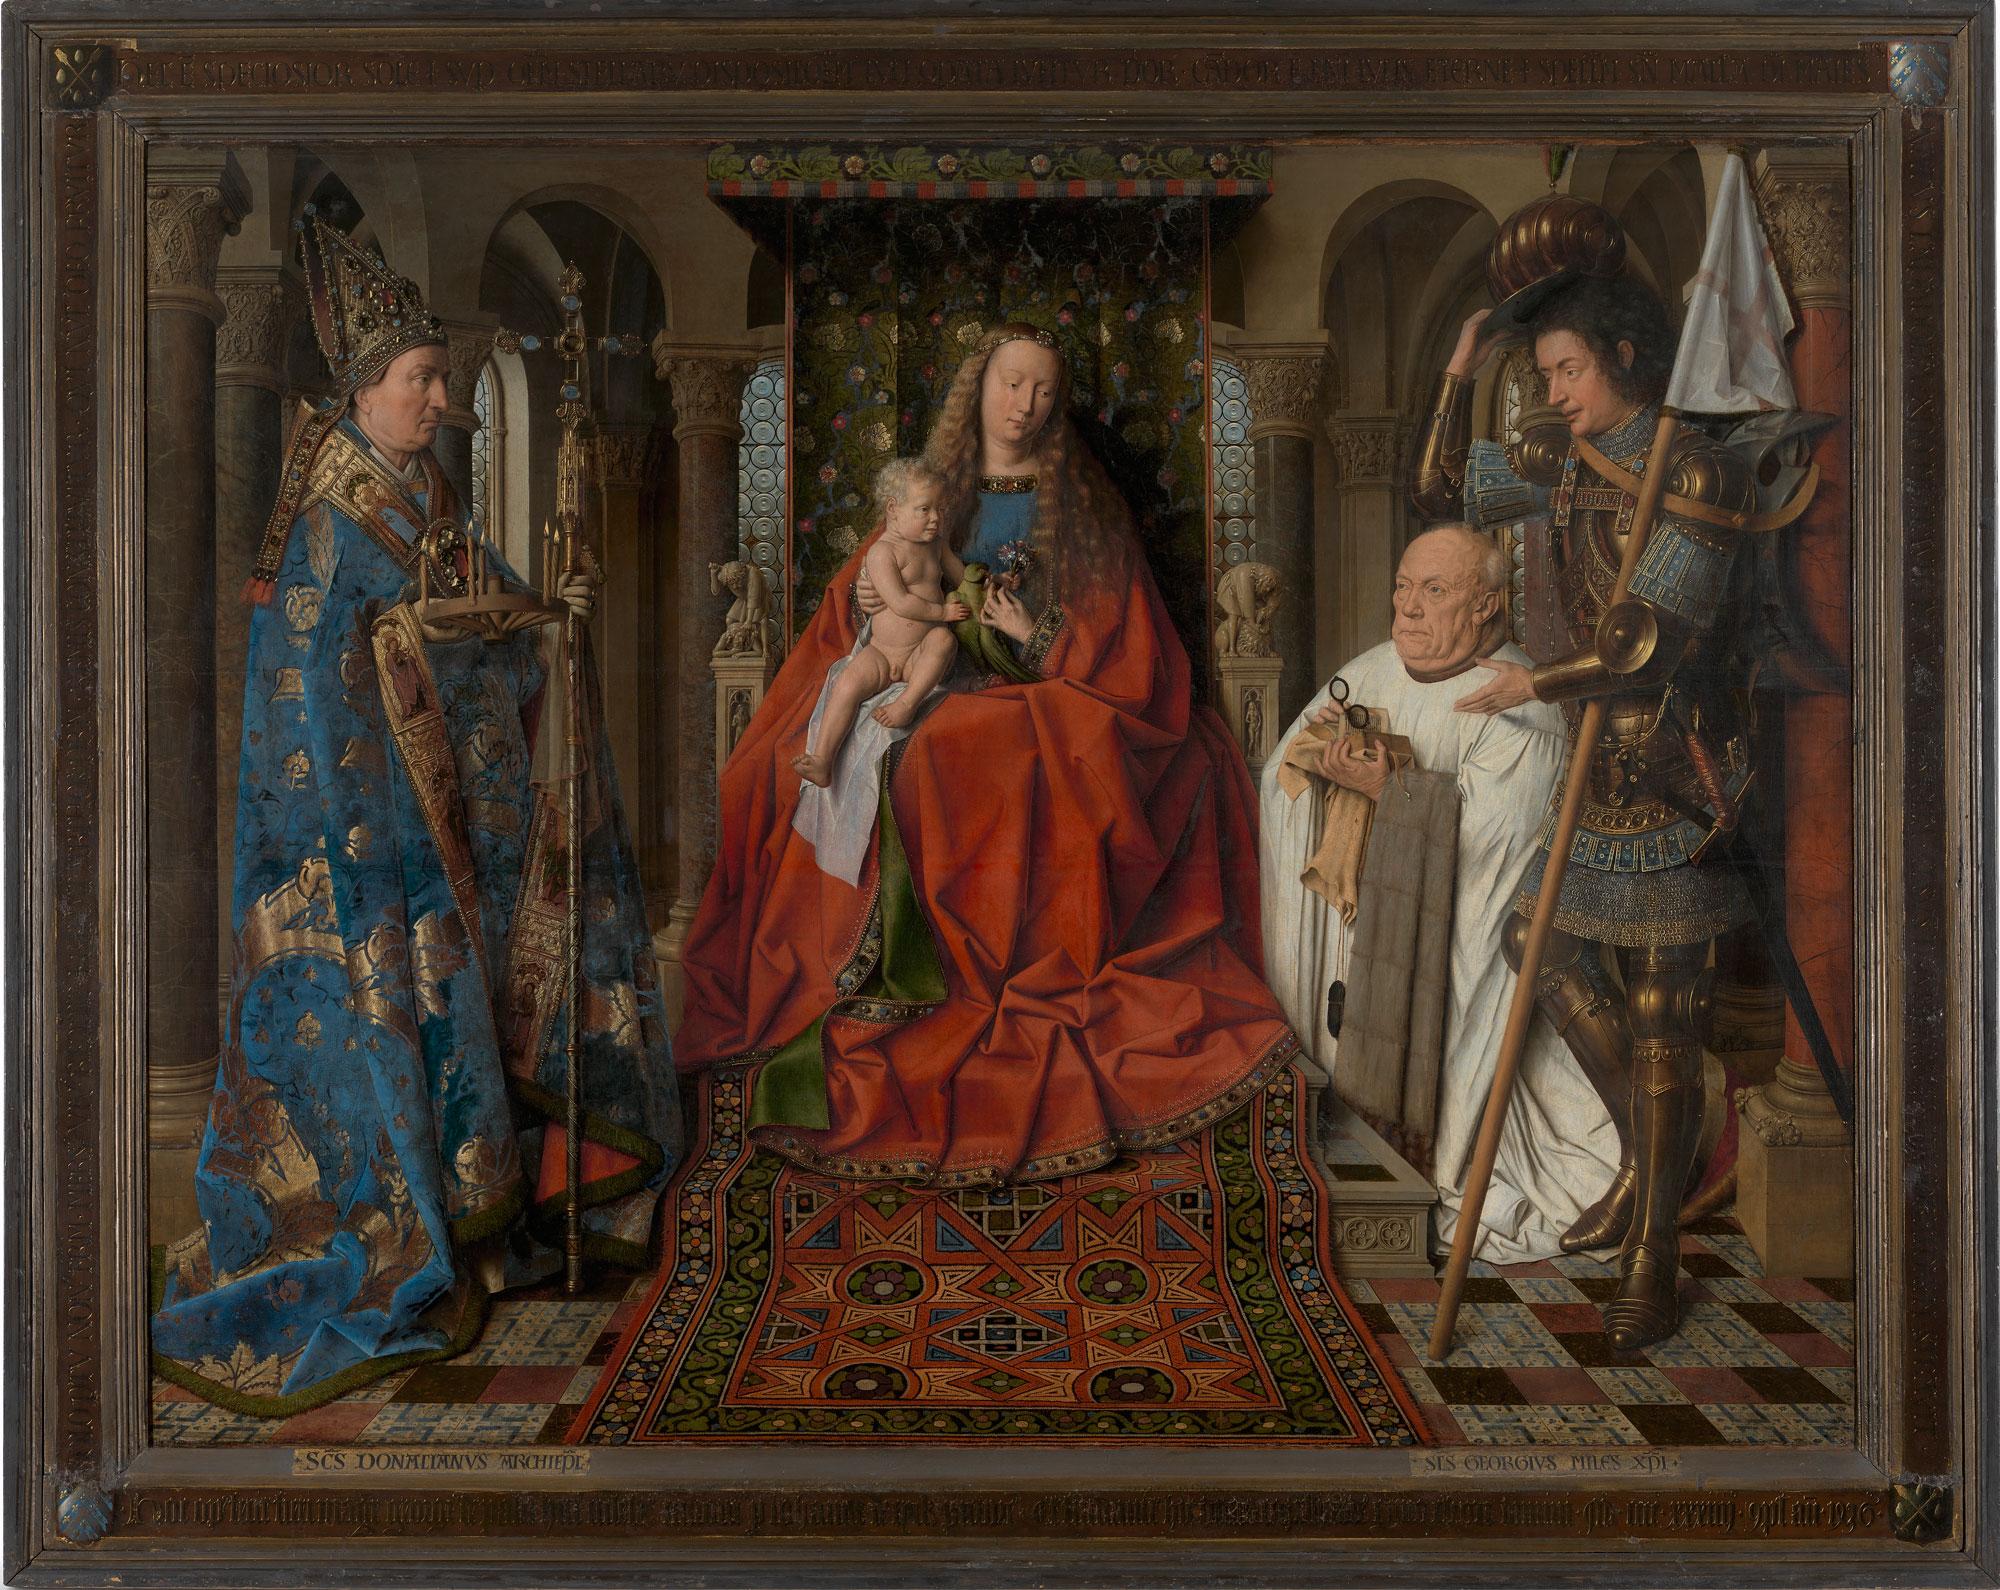 Jan van Eyck, Madonna del canonico Van der Paele (1436; olio su tavola, 122,1 x 157,8 cm; Bruges, Groeninge Museum)